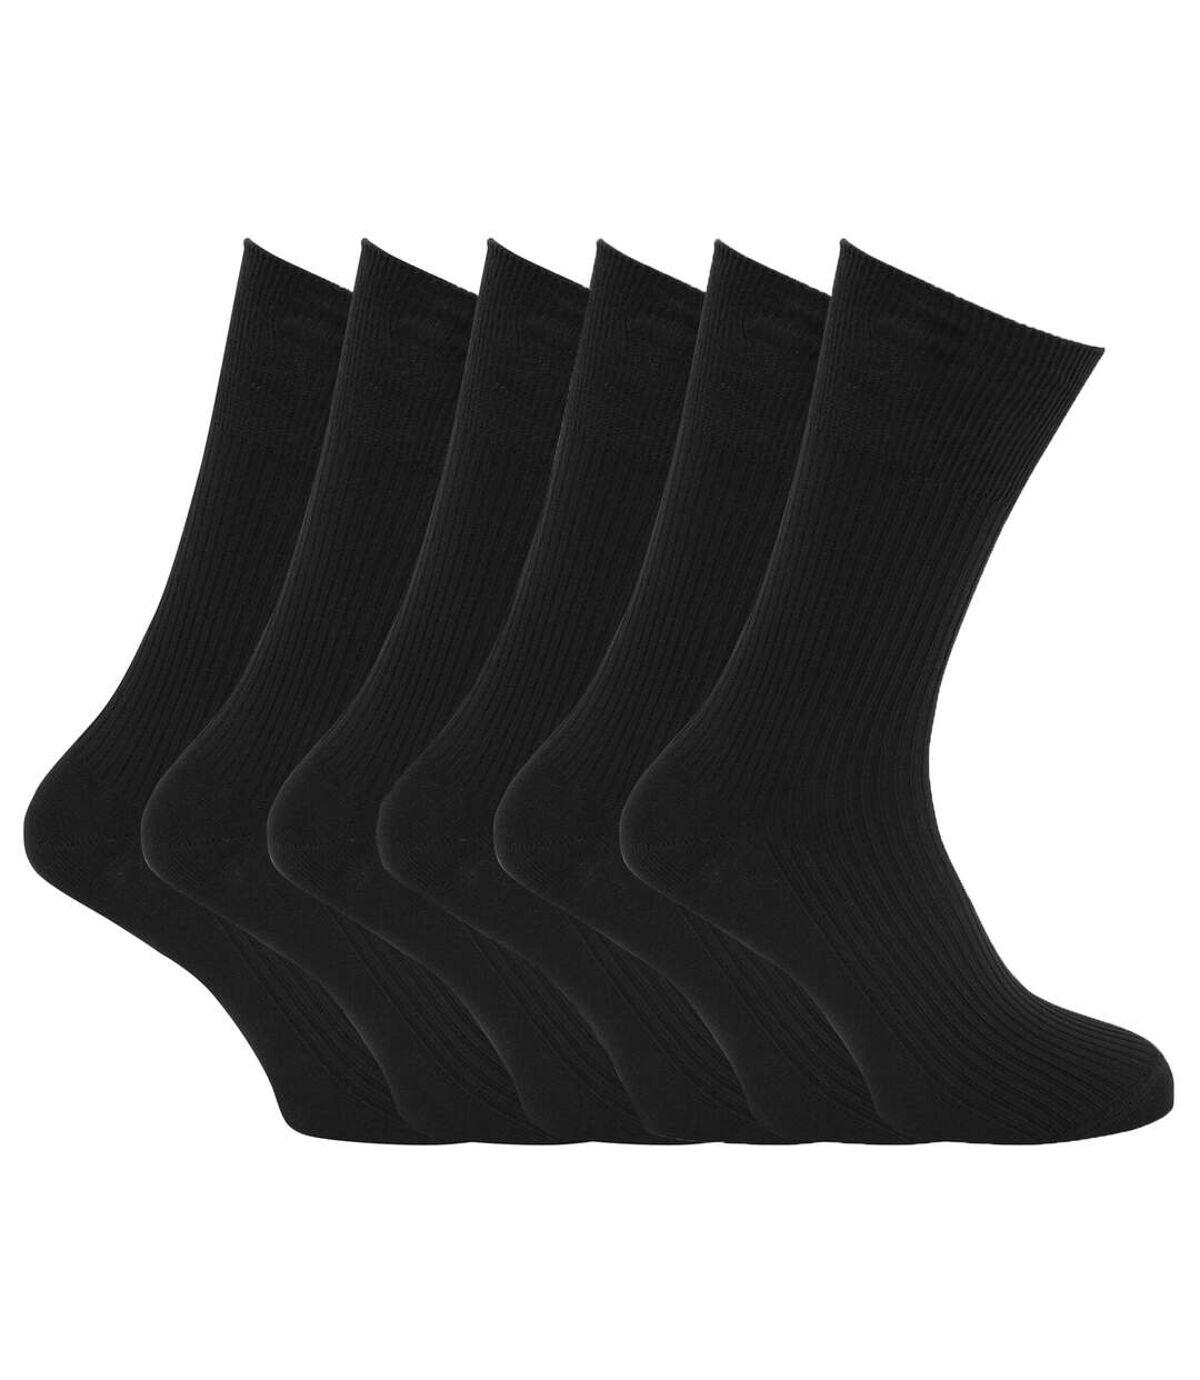 Specialist Item: Mens Ribbed XL Non Elastic Top Socks (Pack Of 6) (Black) - Spec1CottonXL